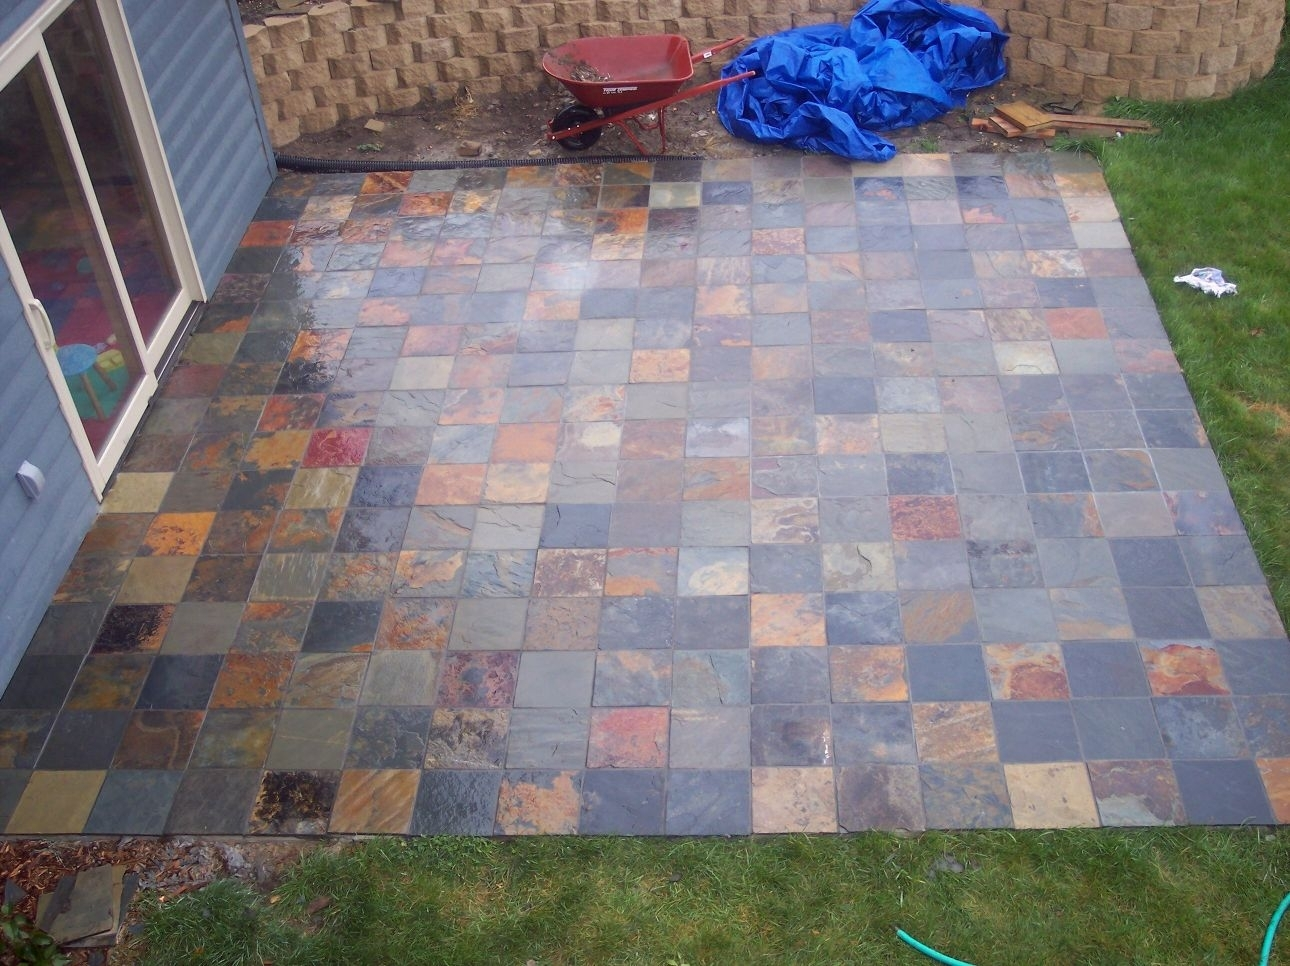 New Rubber Deck Tiles